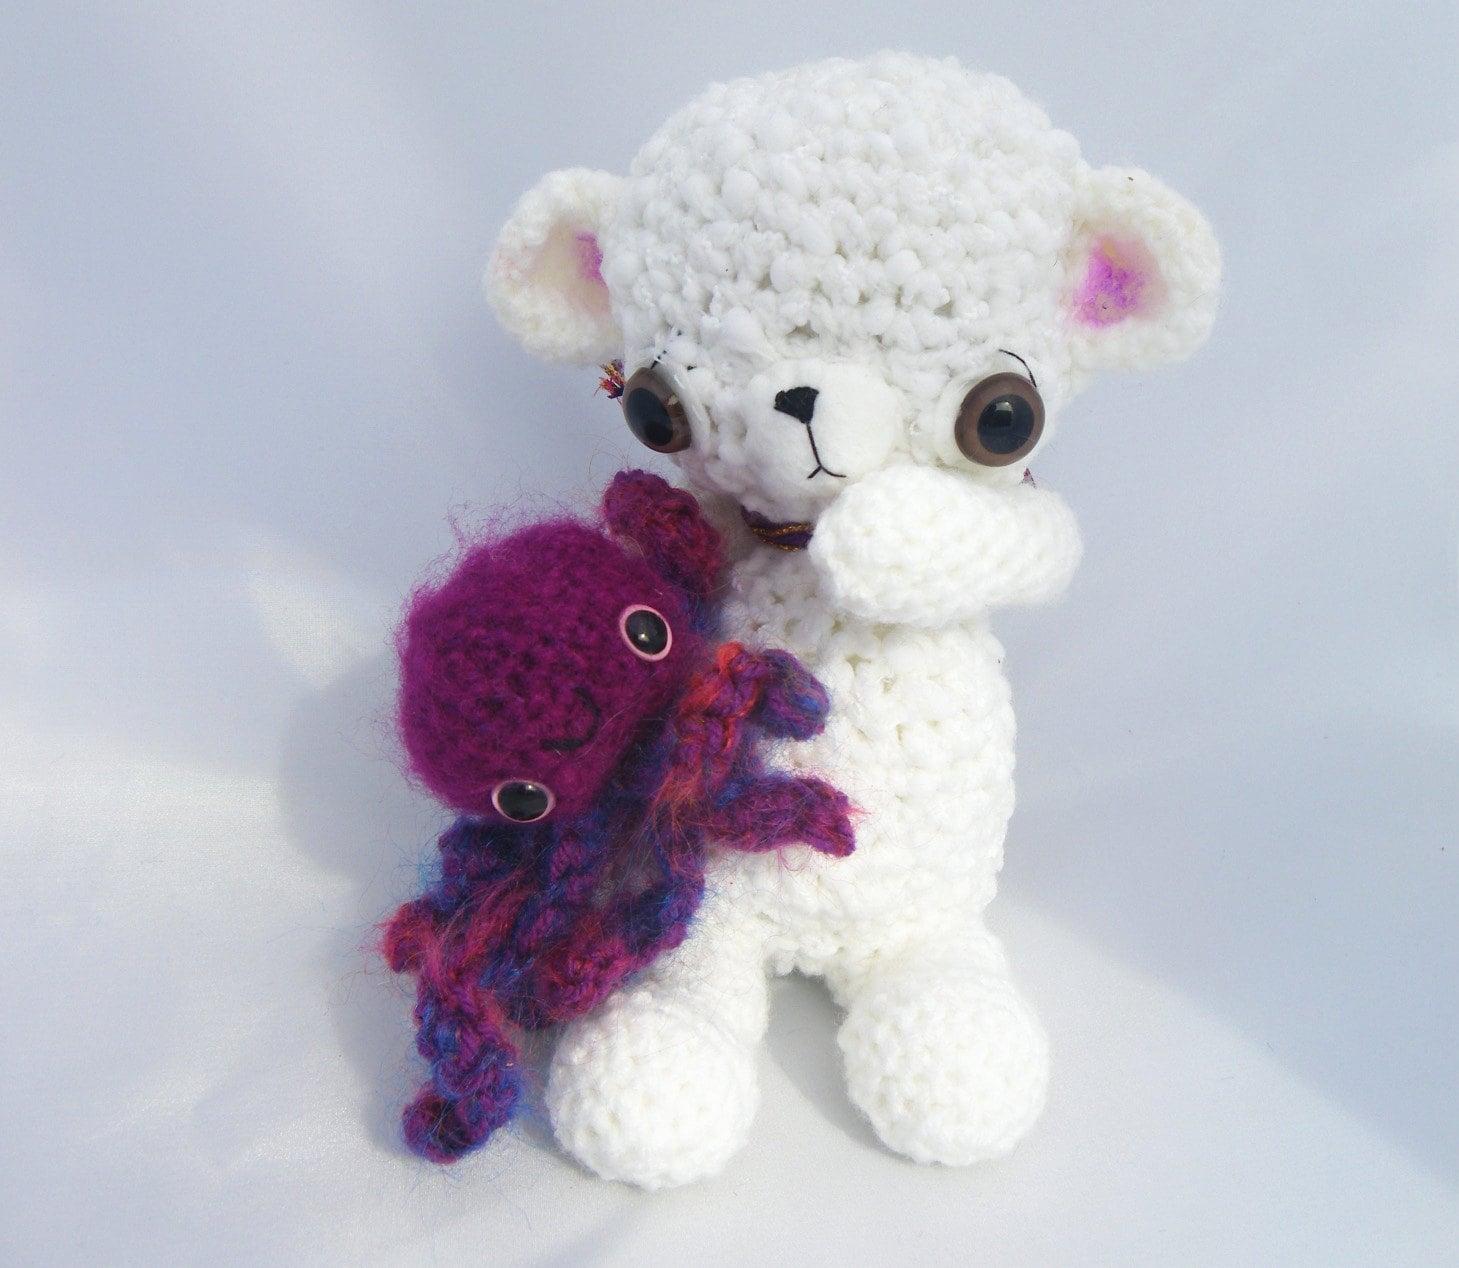 Octopus Amigurumi Plush : bear octopus plush amigurumi stuffed animal by GretelCreations